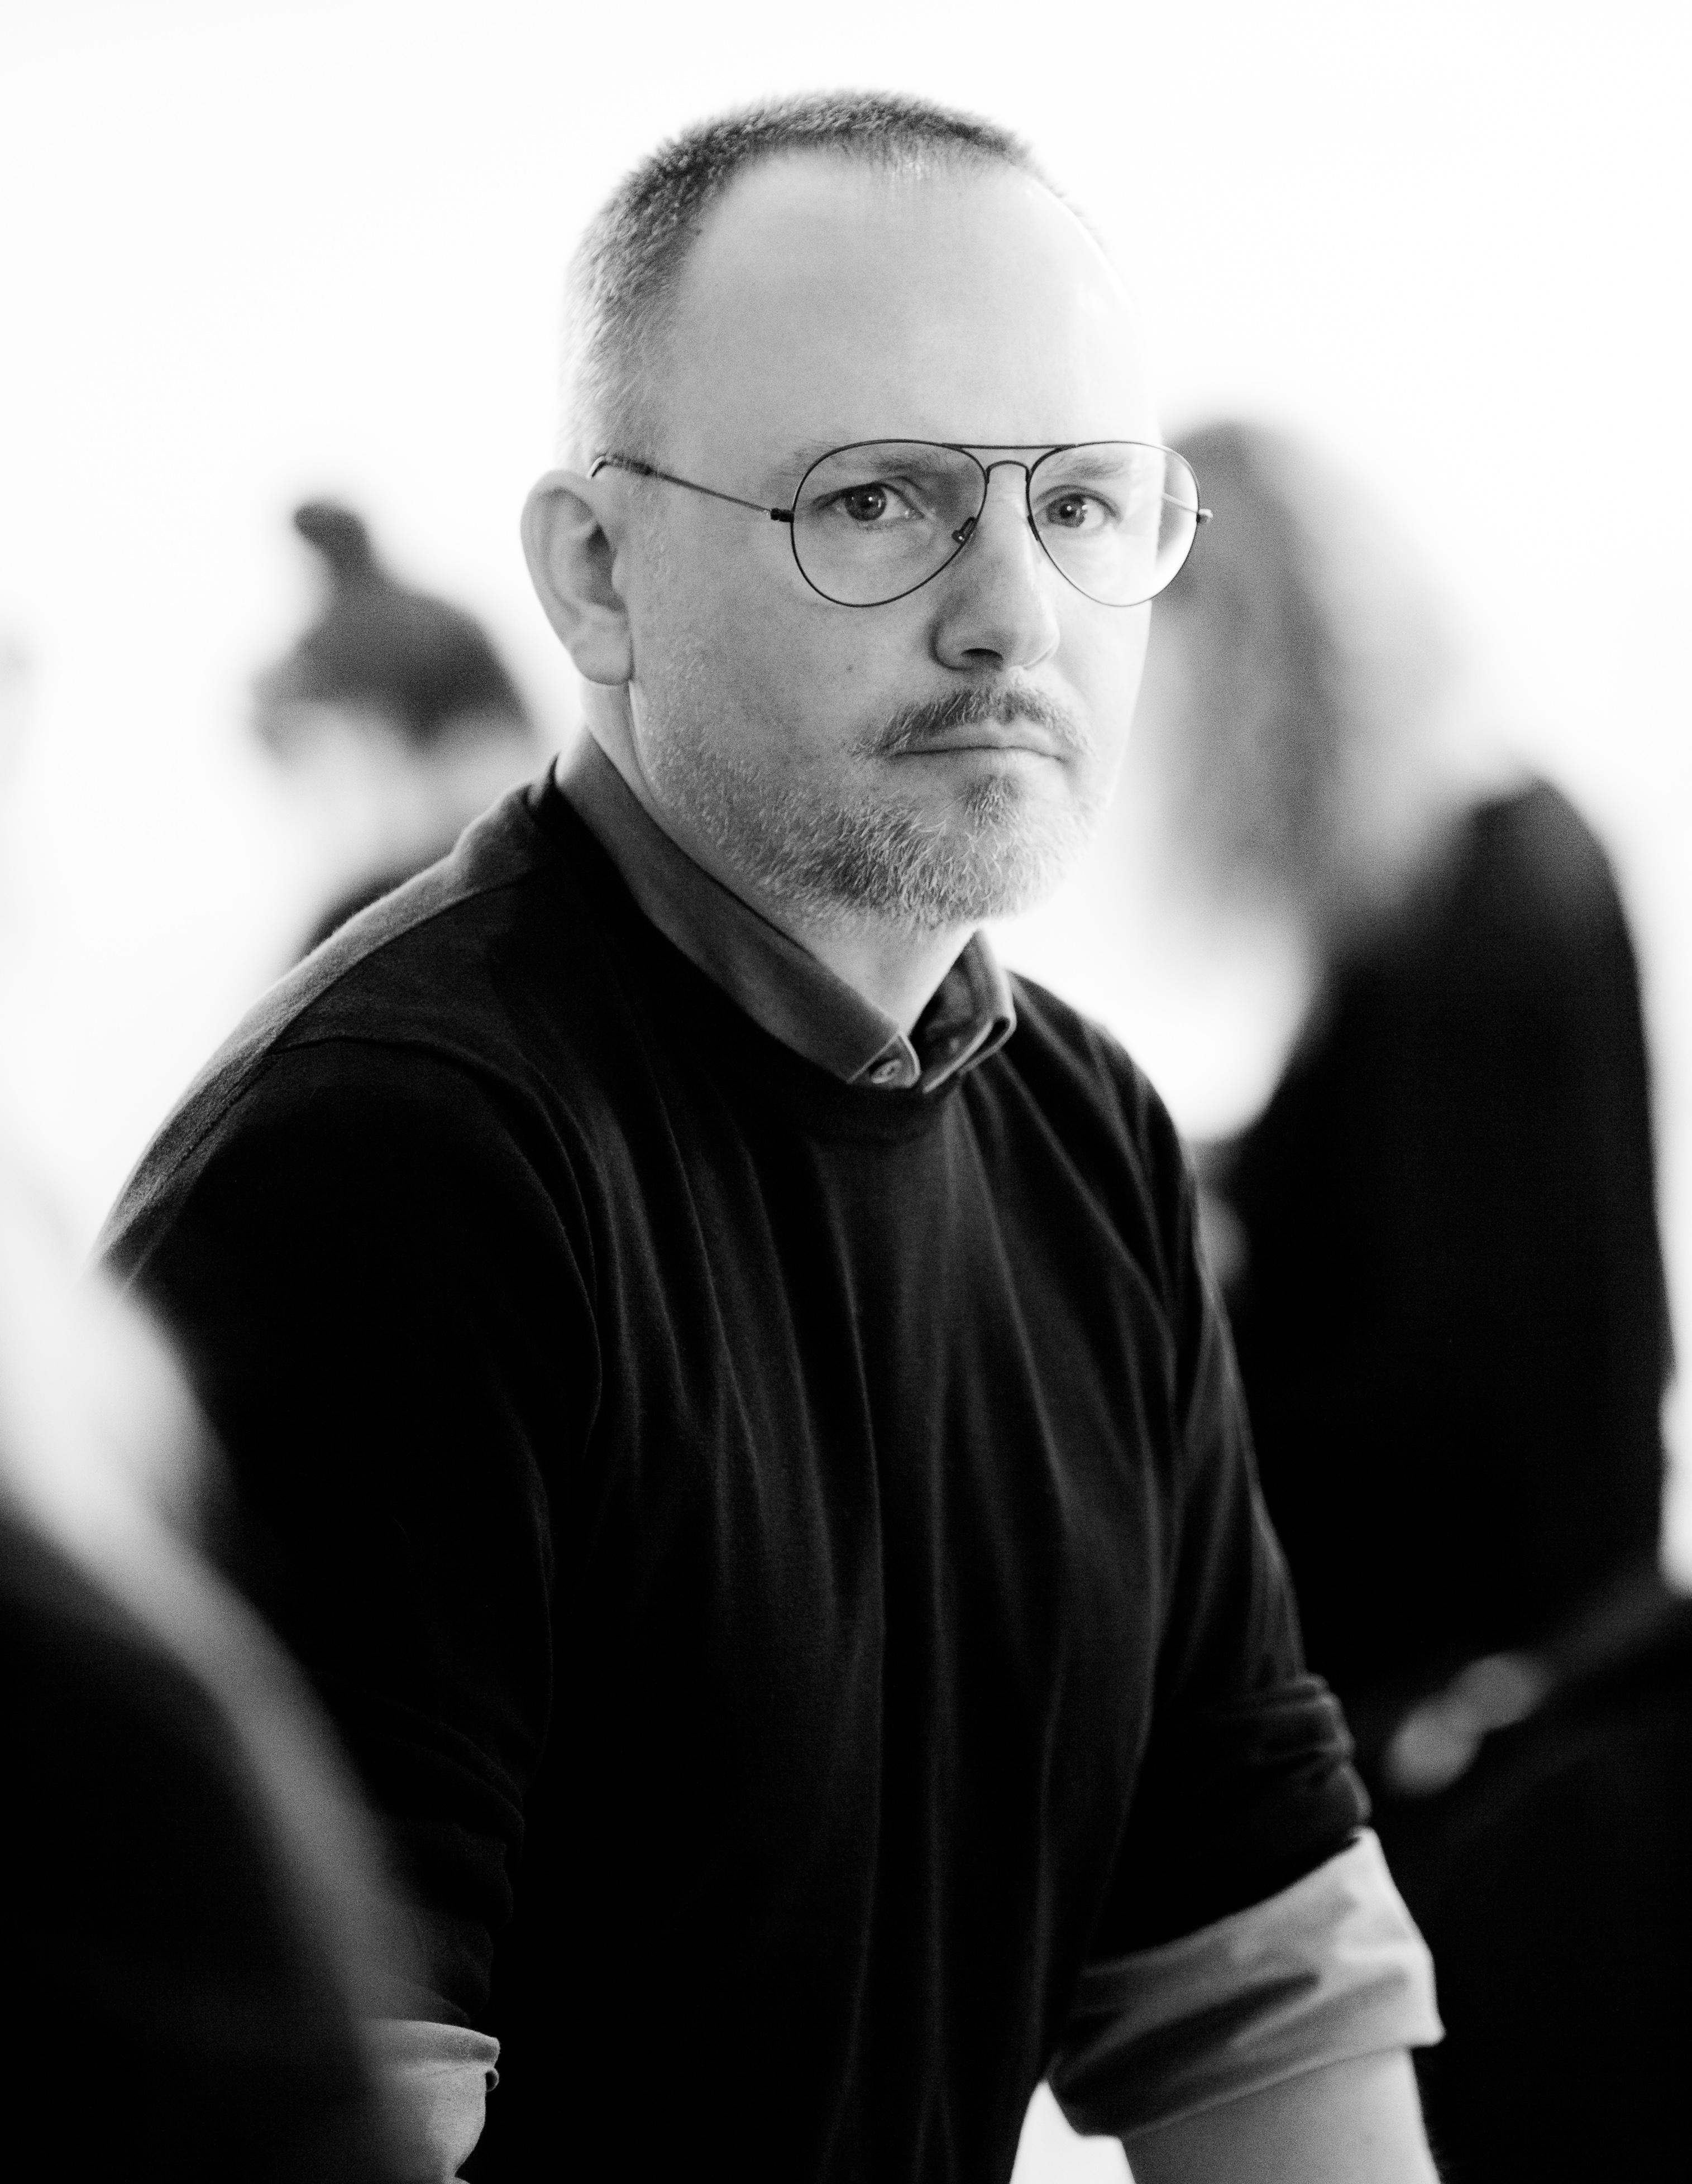 Peter Philips